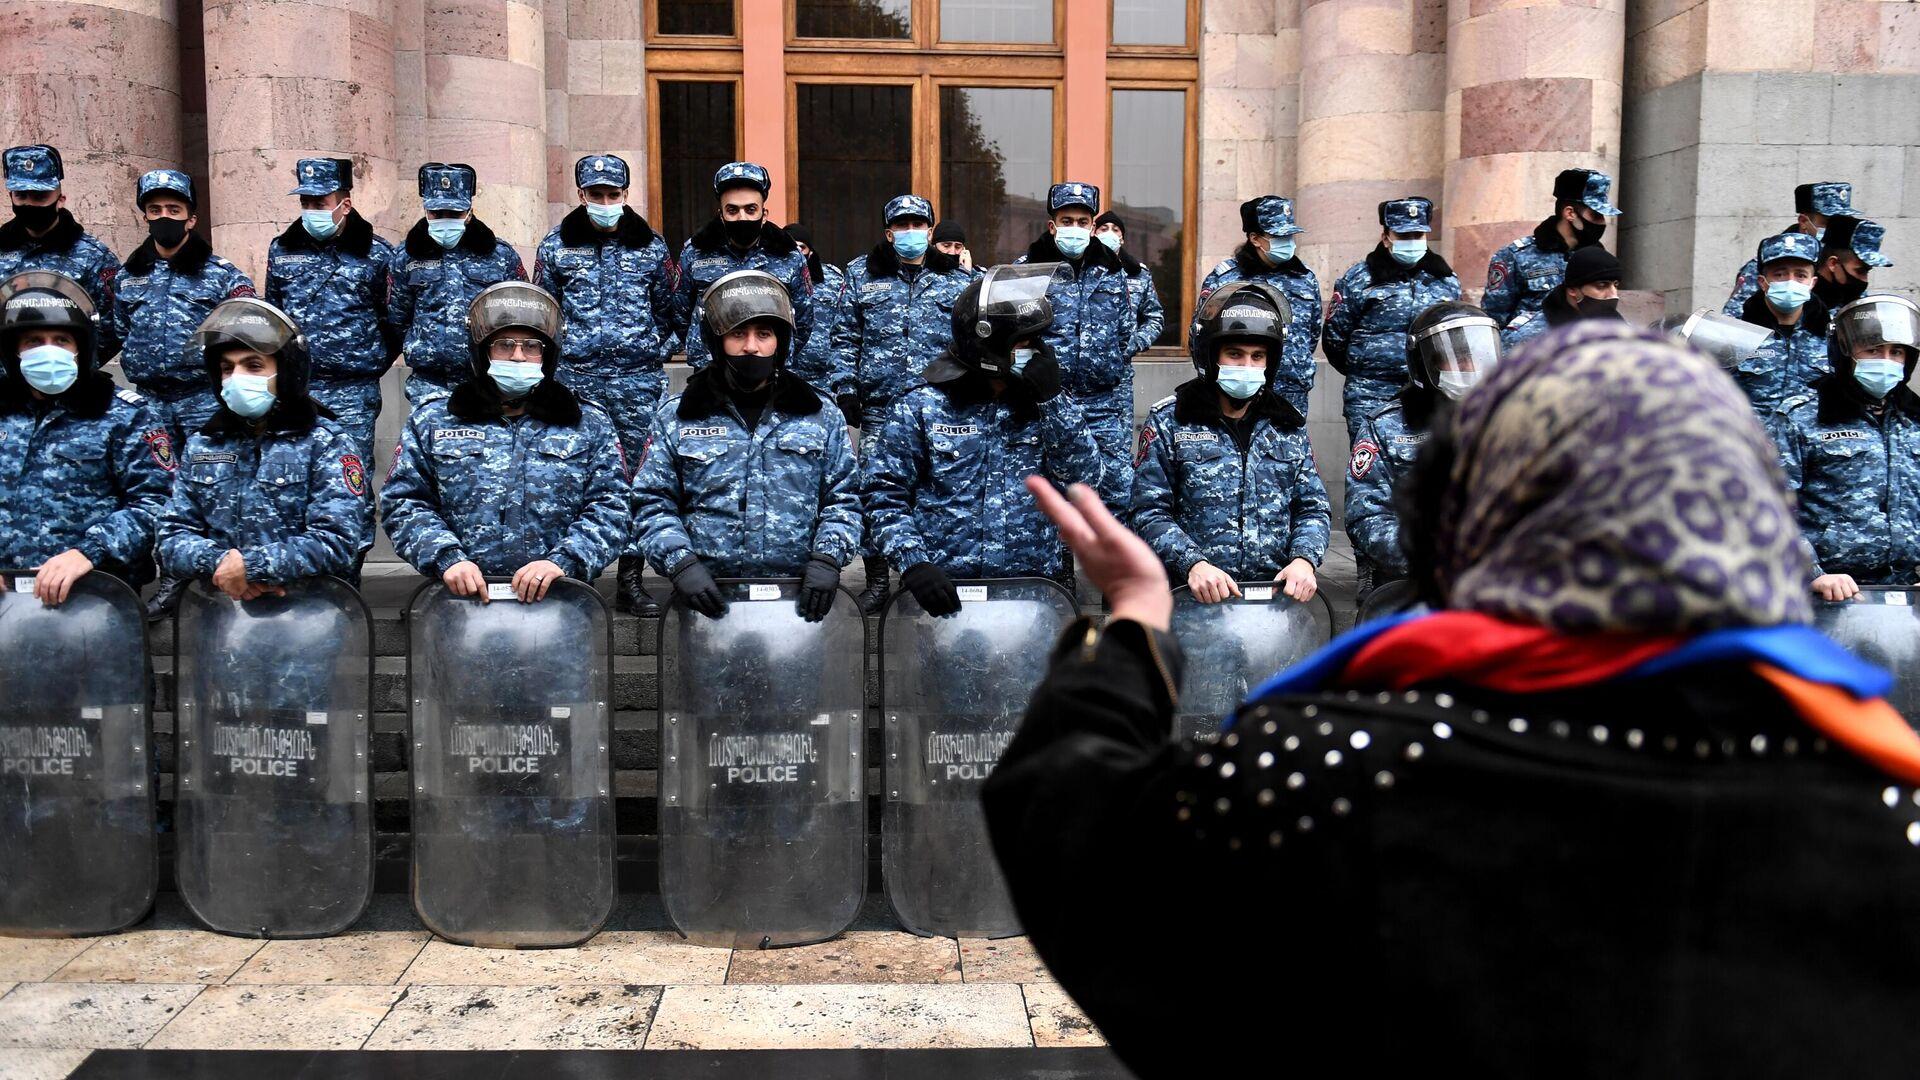 Сотрудники полиции следят за соблюдением порядка во время акции протеста в Ереване - РИА Новости, 1920, 16.12.2020